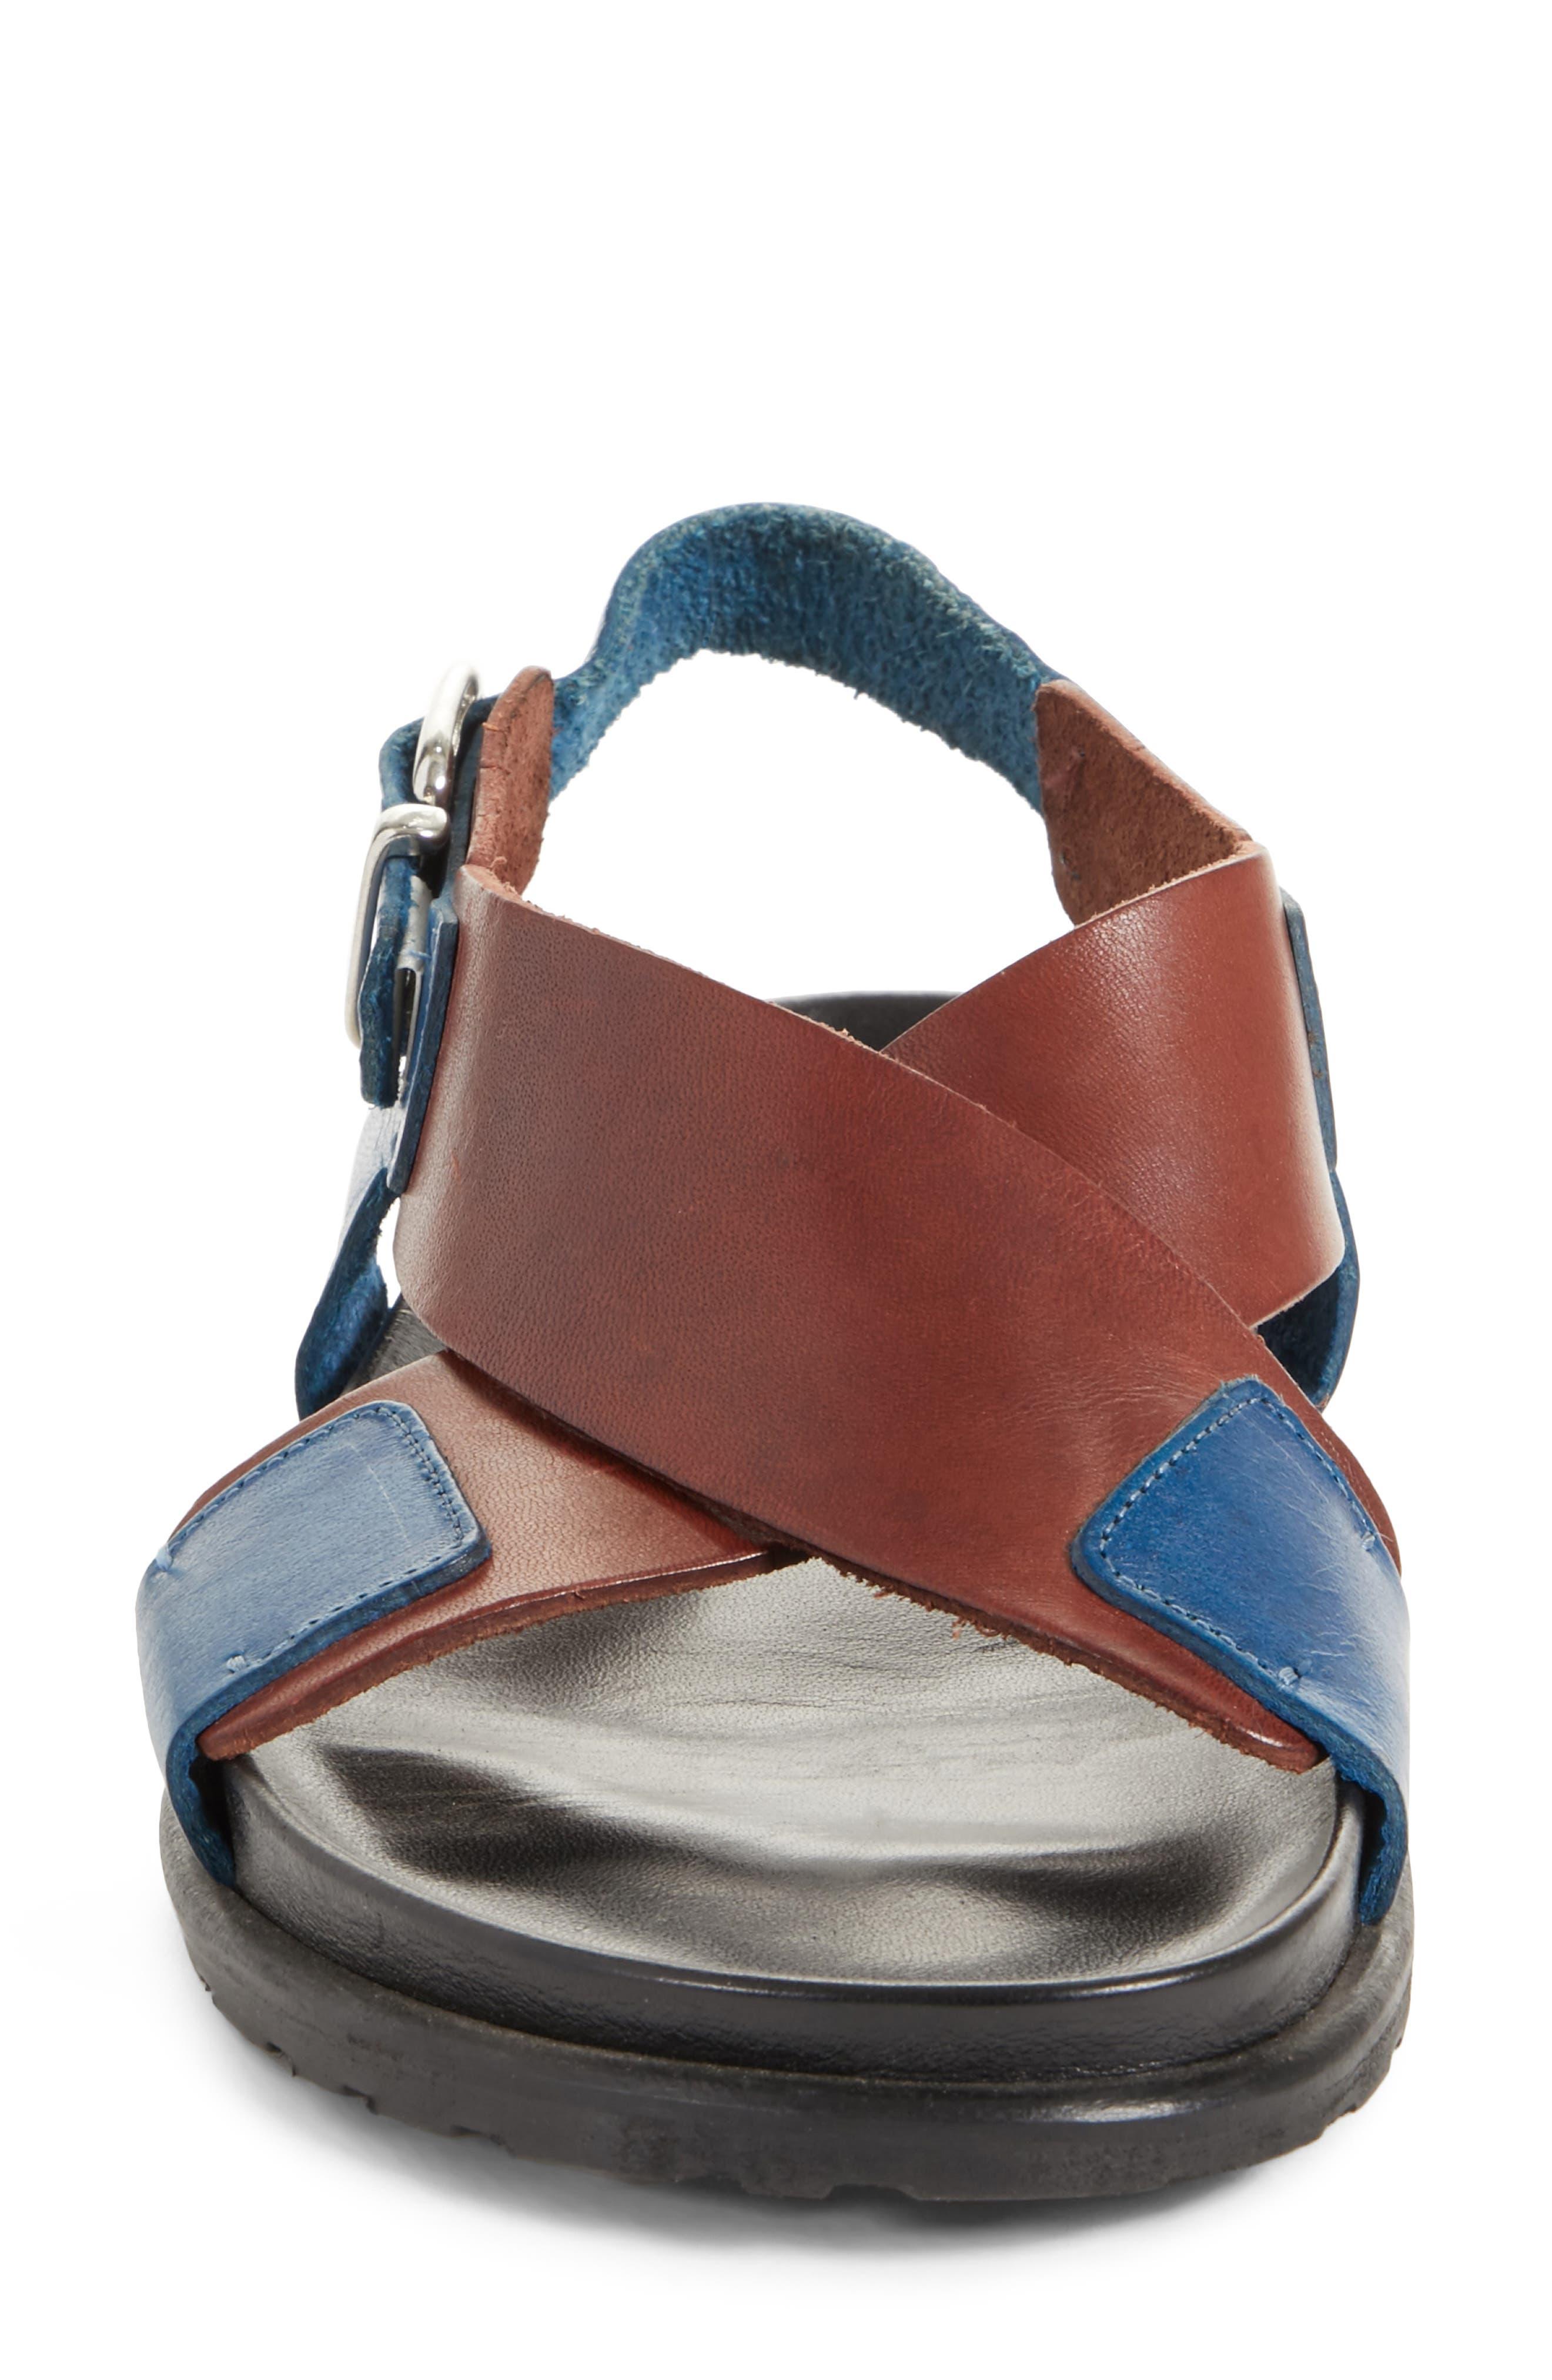 Bicolor Strappy Sandal,                             Alternate thumbnail 4, color,                             200